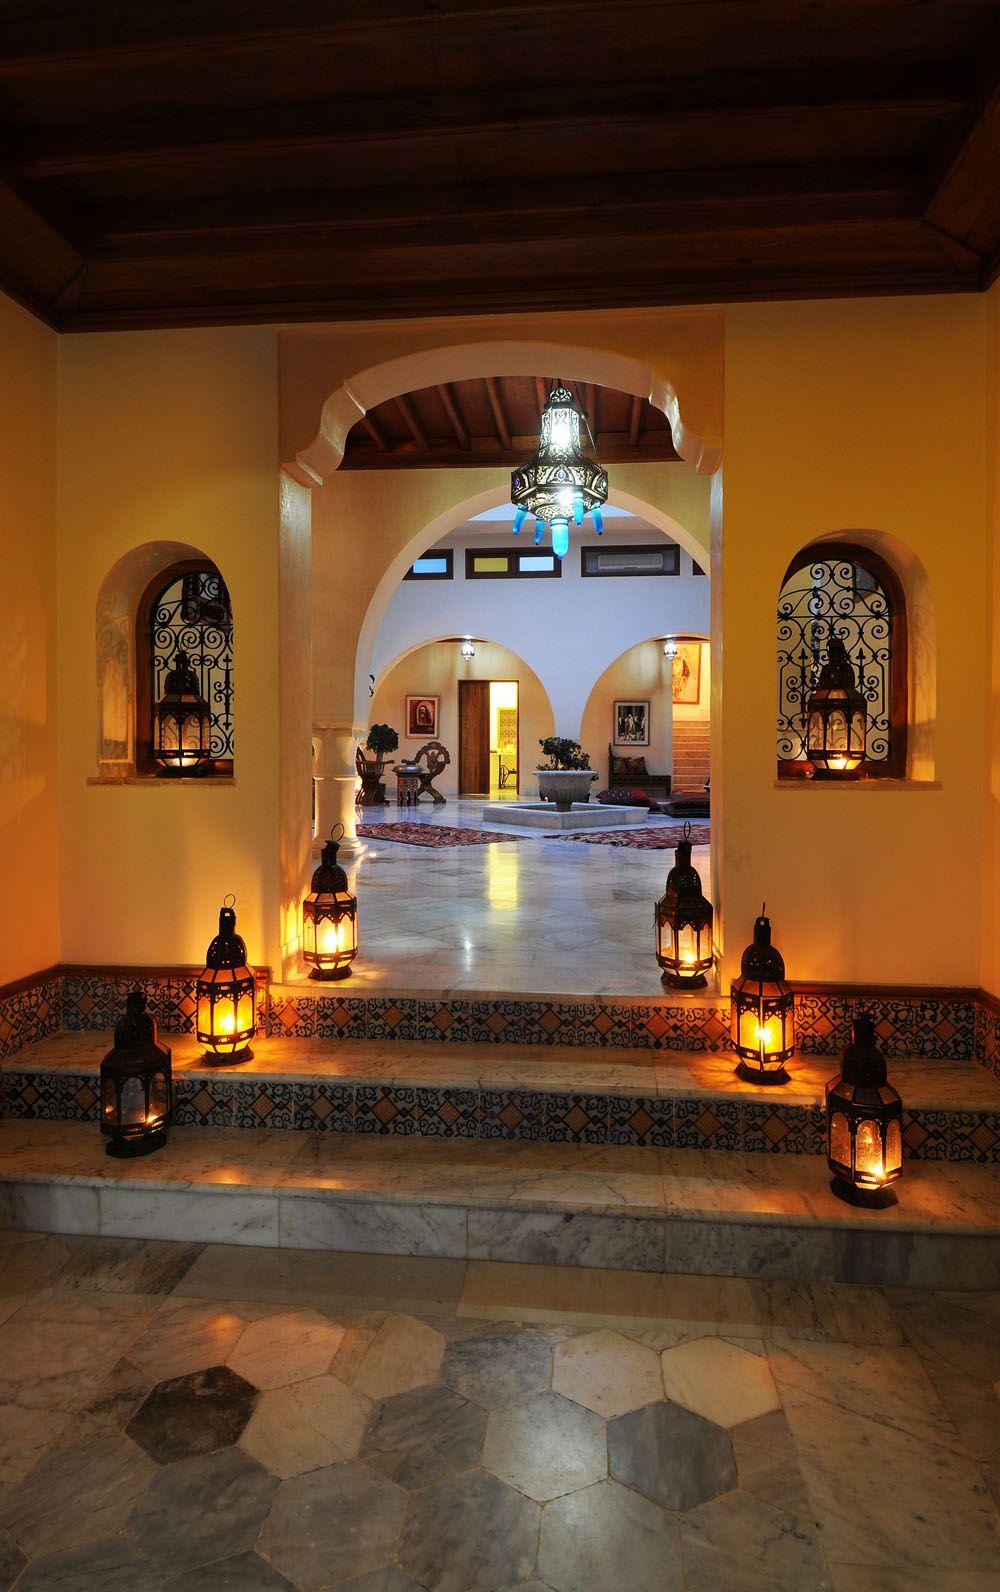 Bienvenue Places To Visit Tunisie Maison Tunisie Destinations